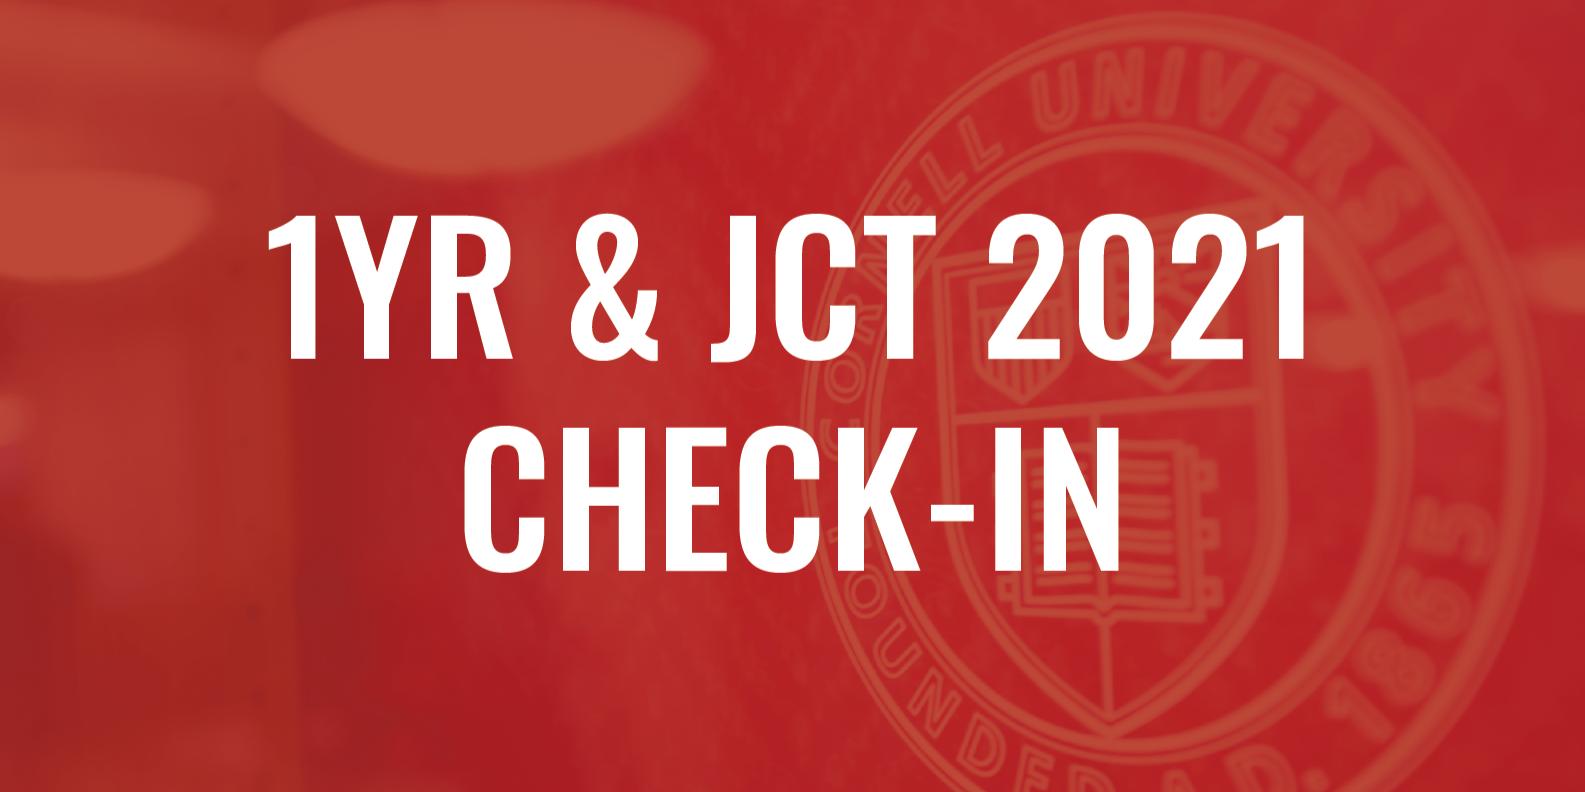 1YR & JCT 2021 Check-In